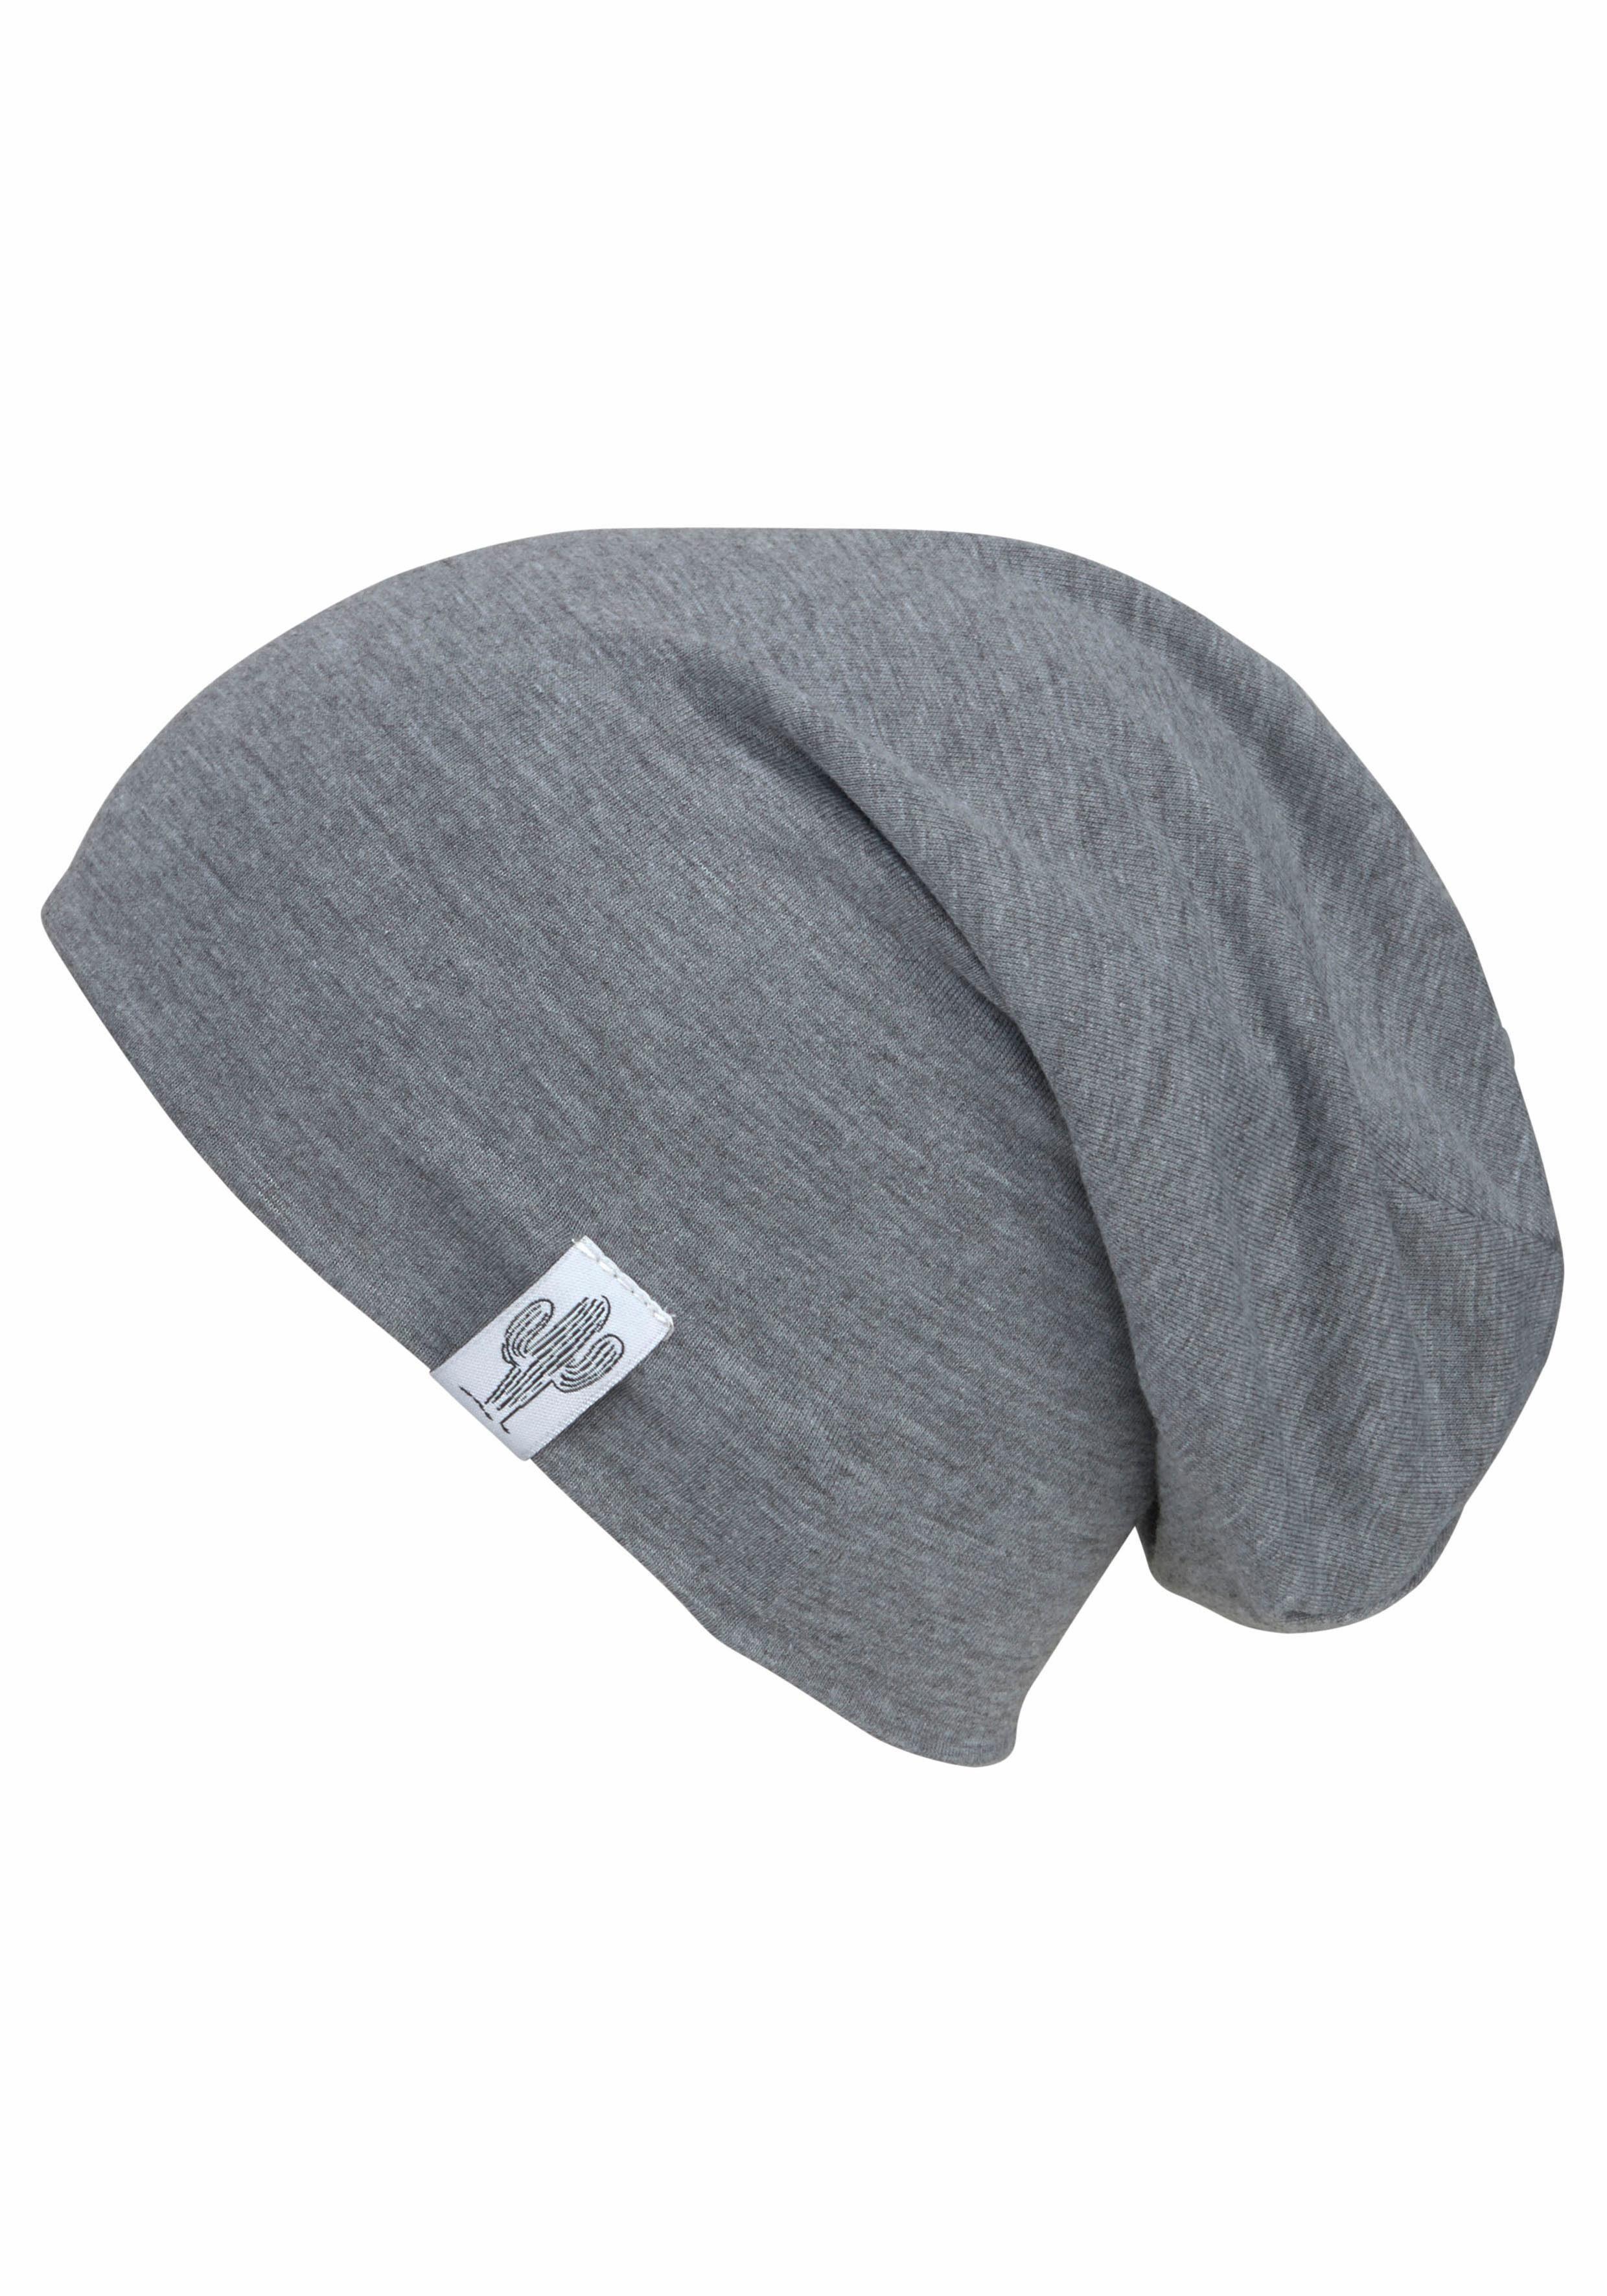 J.Jayz Beanie, Jersey Mütze, Oversize, Logo Flag Label